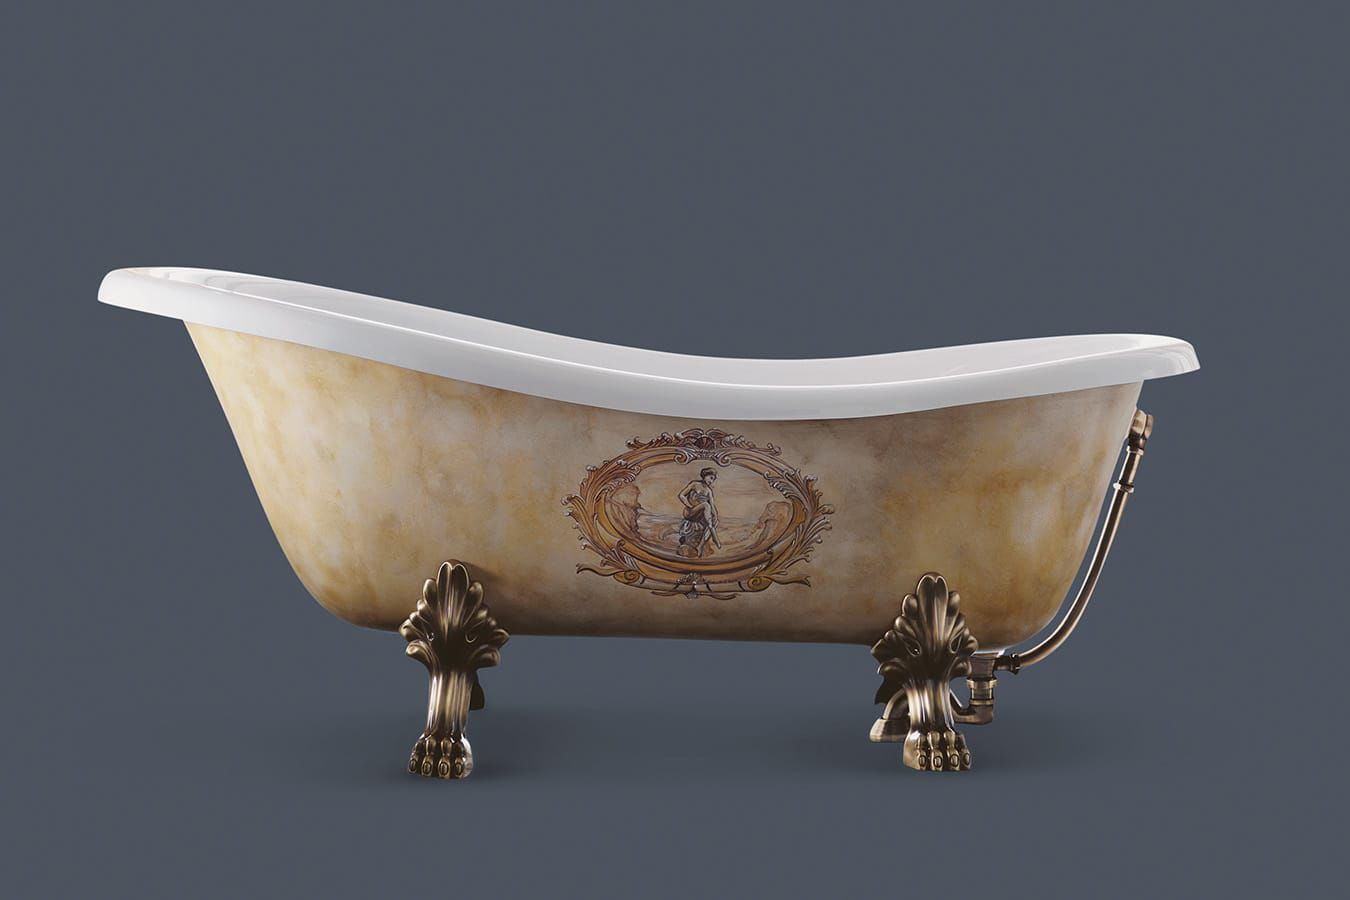 Vasche Da Bagno D Epoca : Vasca d epoca posot class